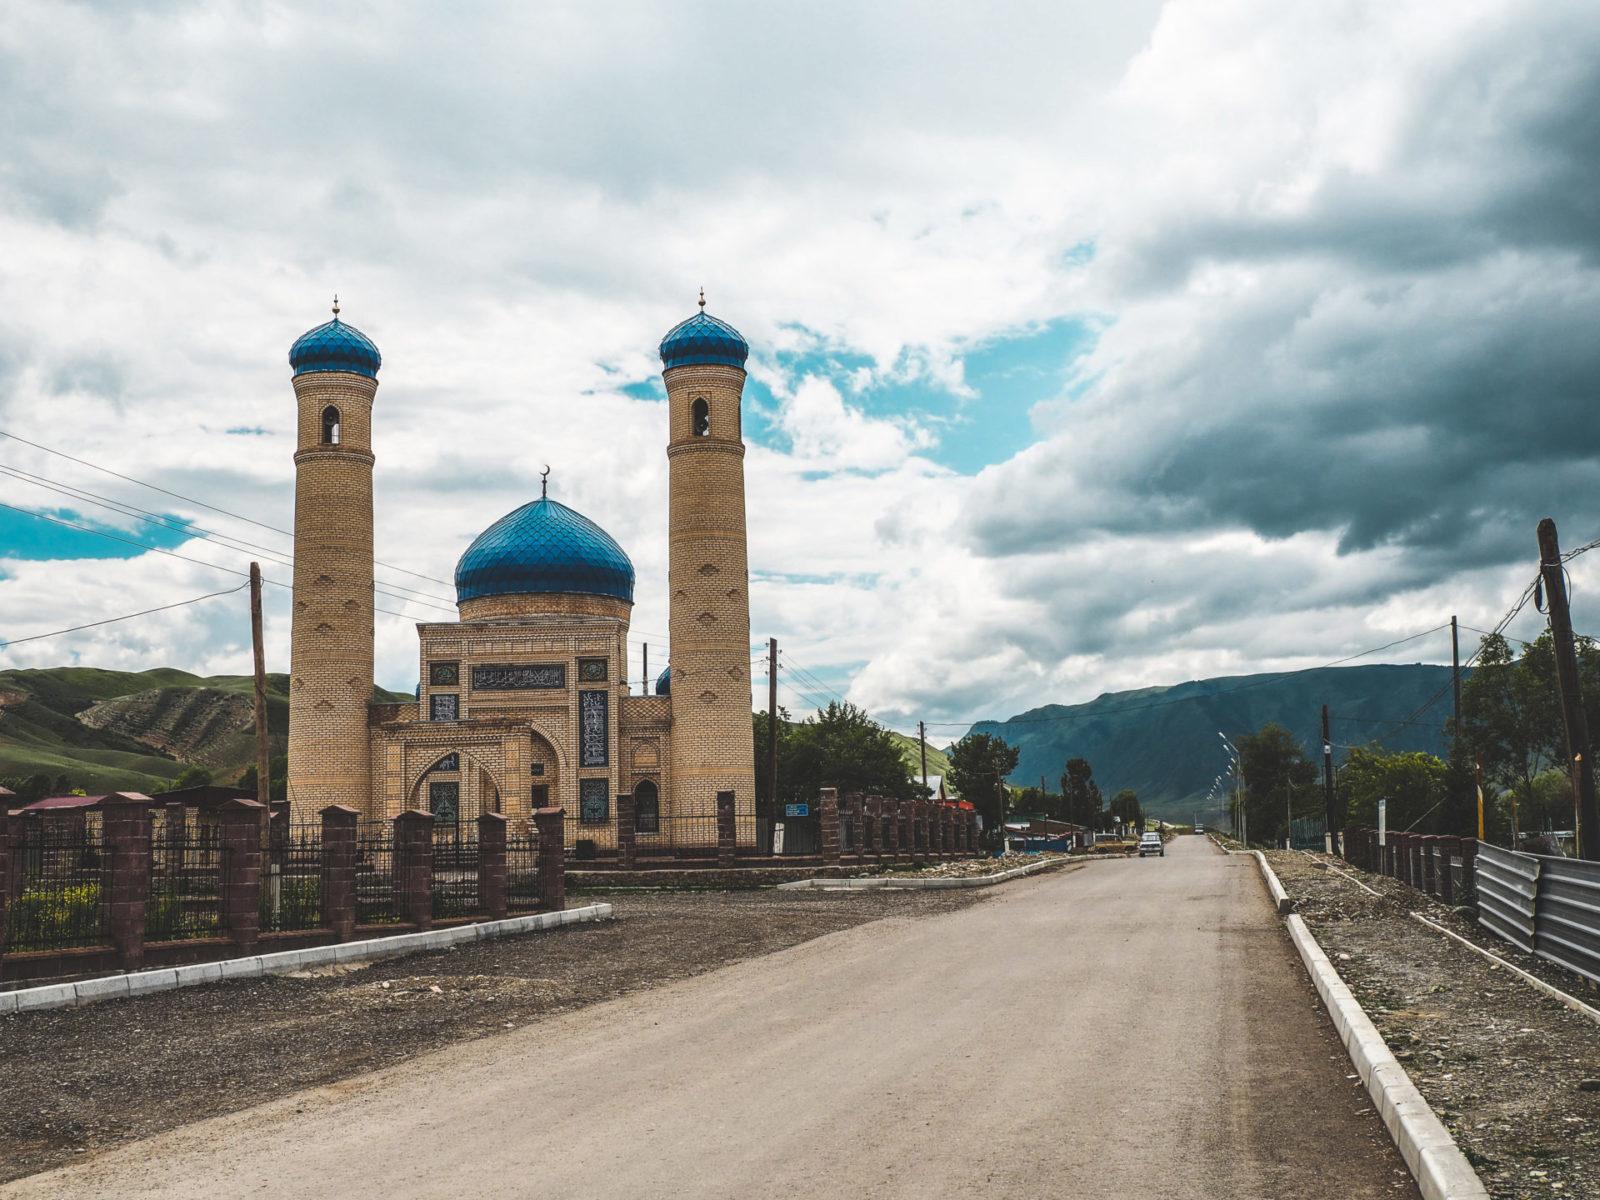 Saty Kazachstan